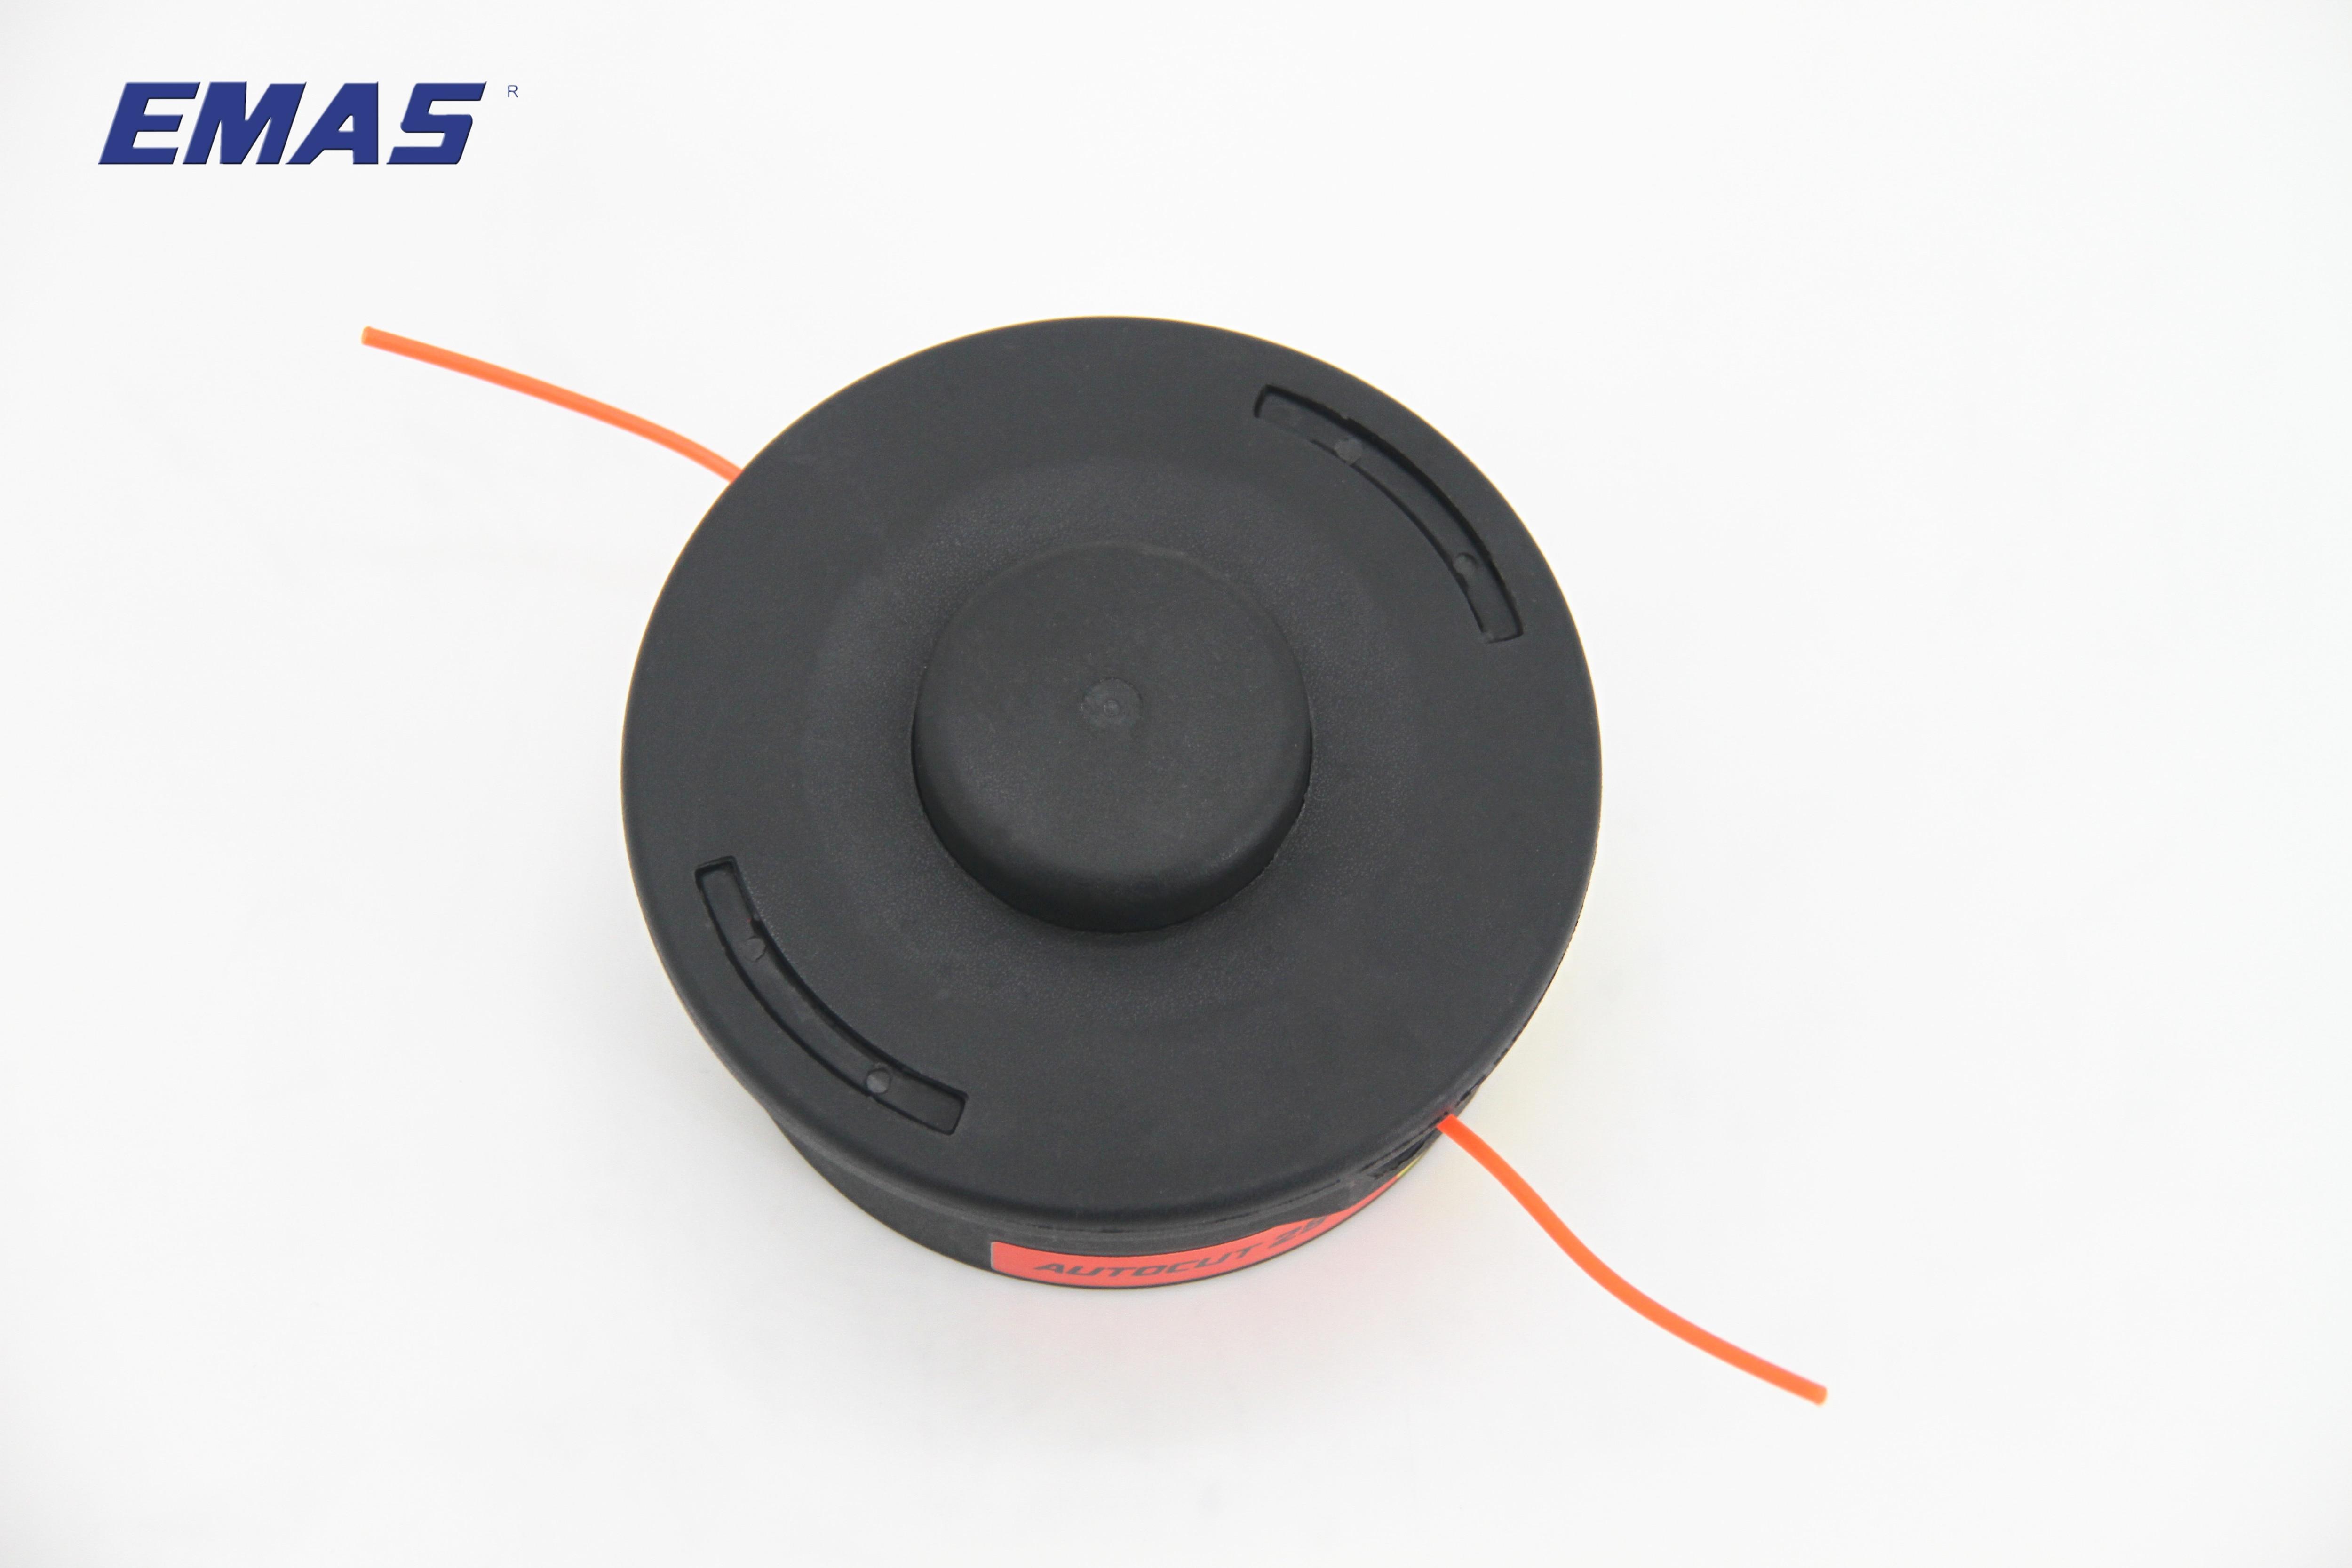 Cabezal de corte de 10MM * 1,0 LHF de alta calidad EMAS para cortadora de escobillas STIHL FS120